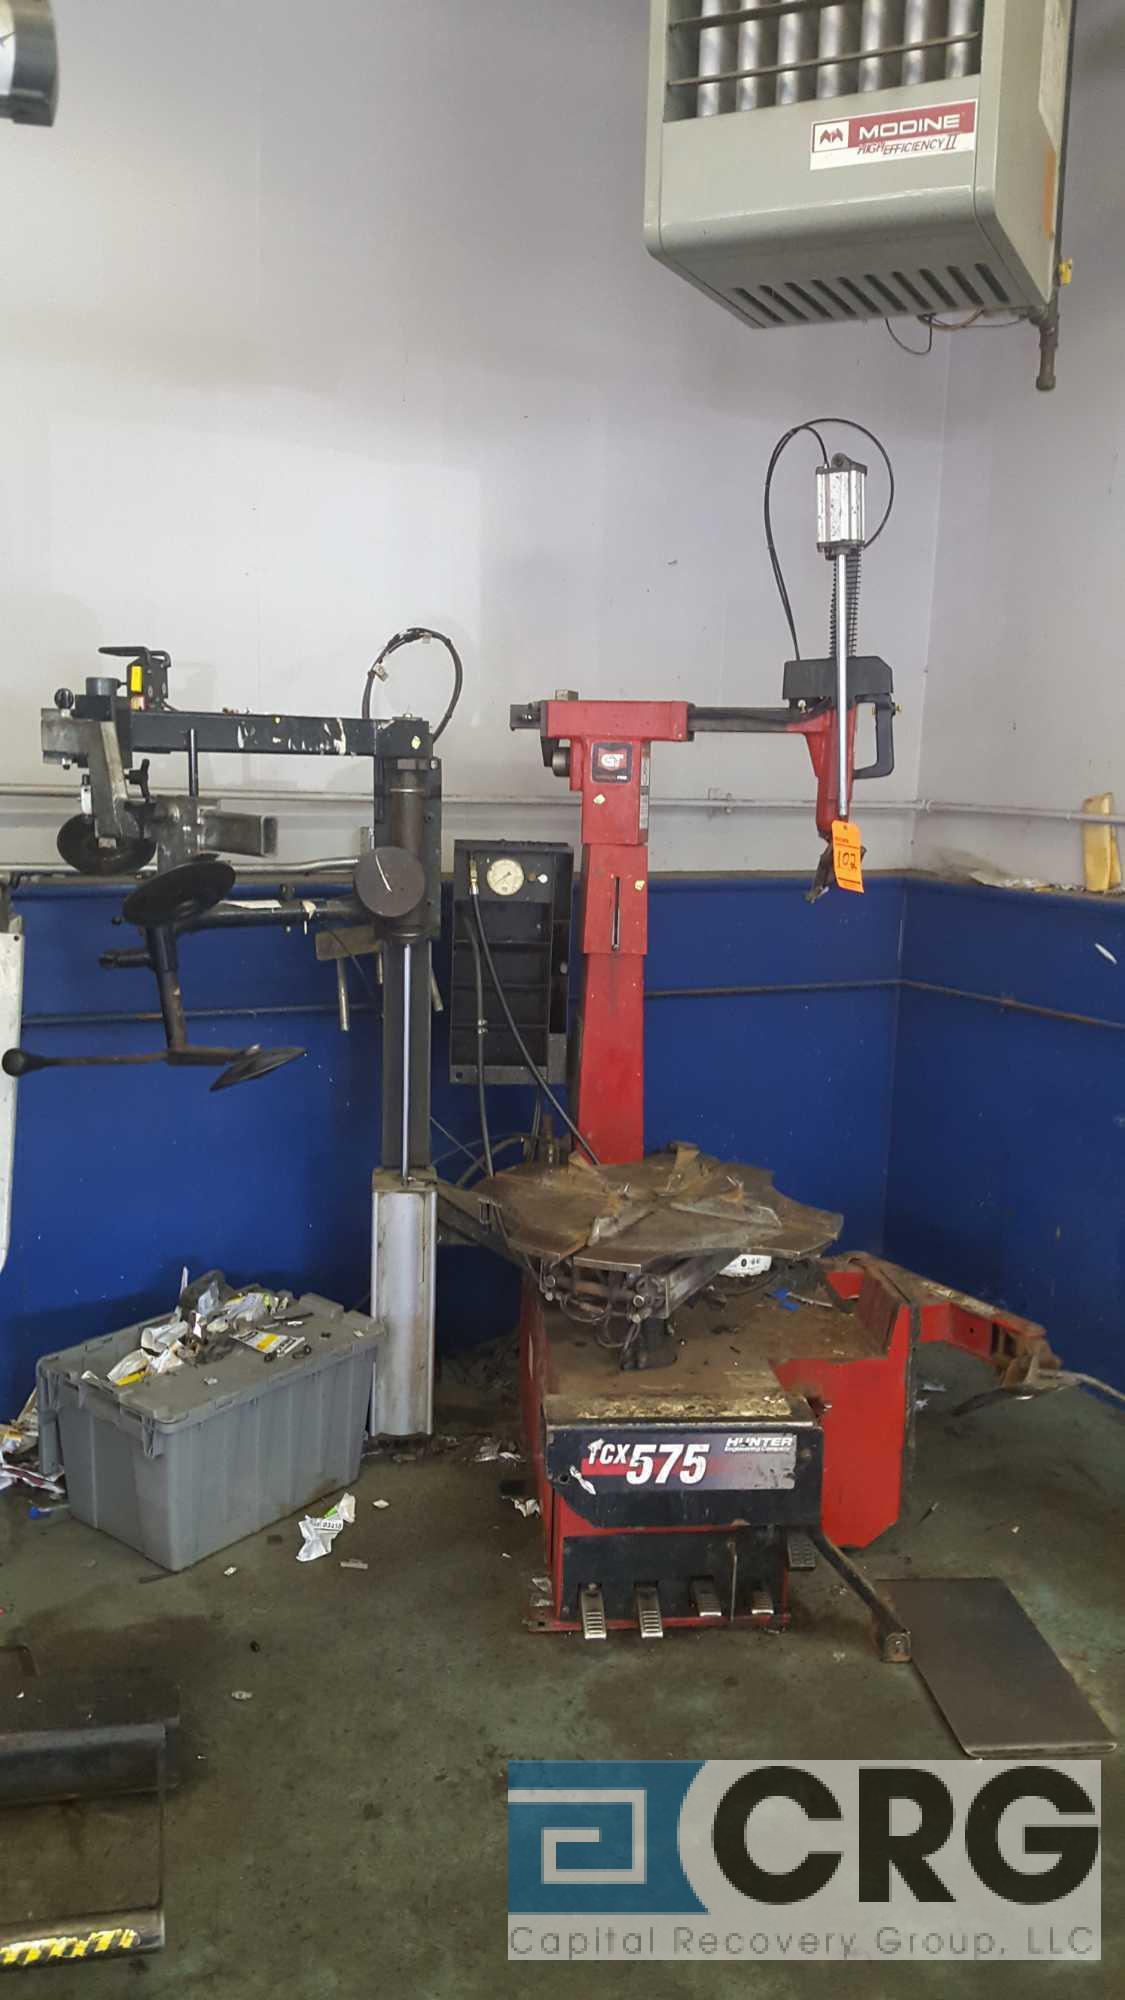 Marcotte Ford - Service Garage Equipment